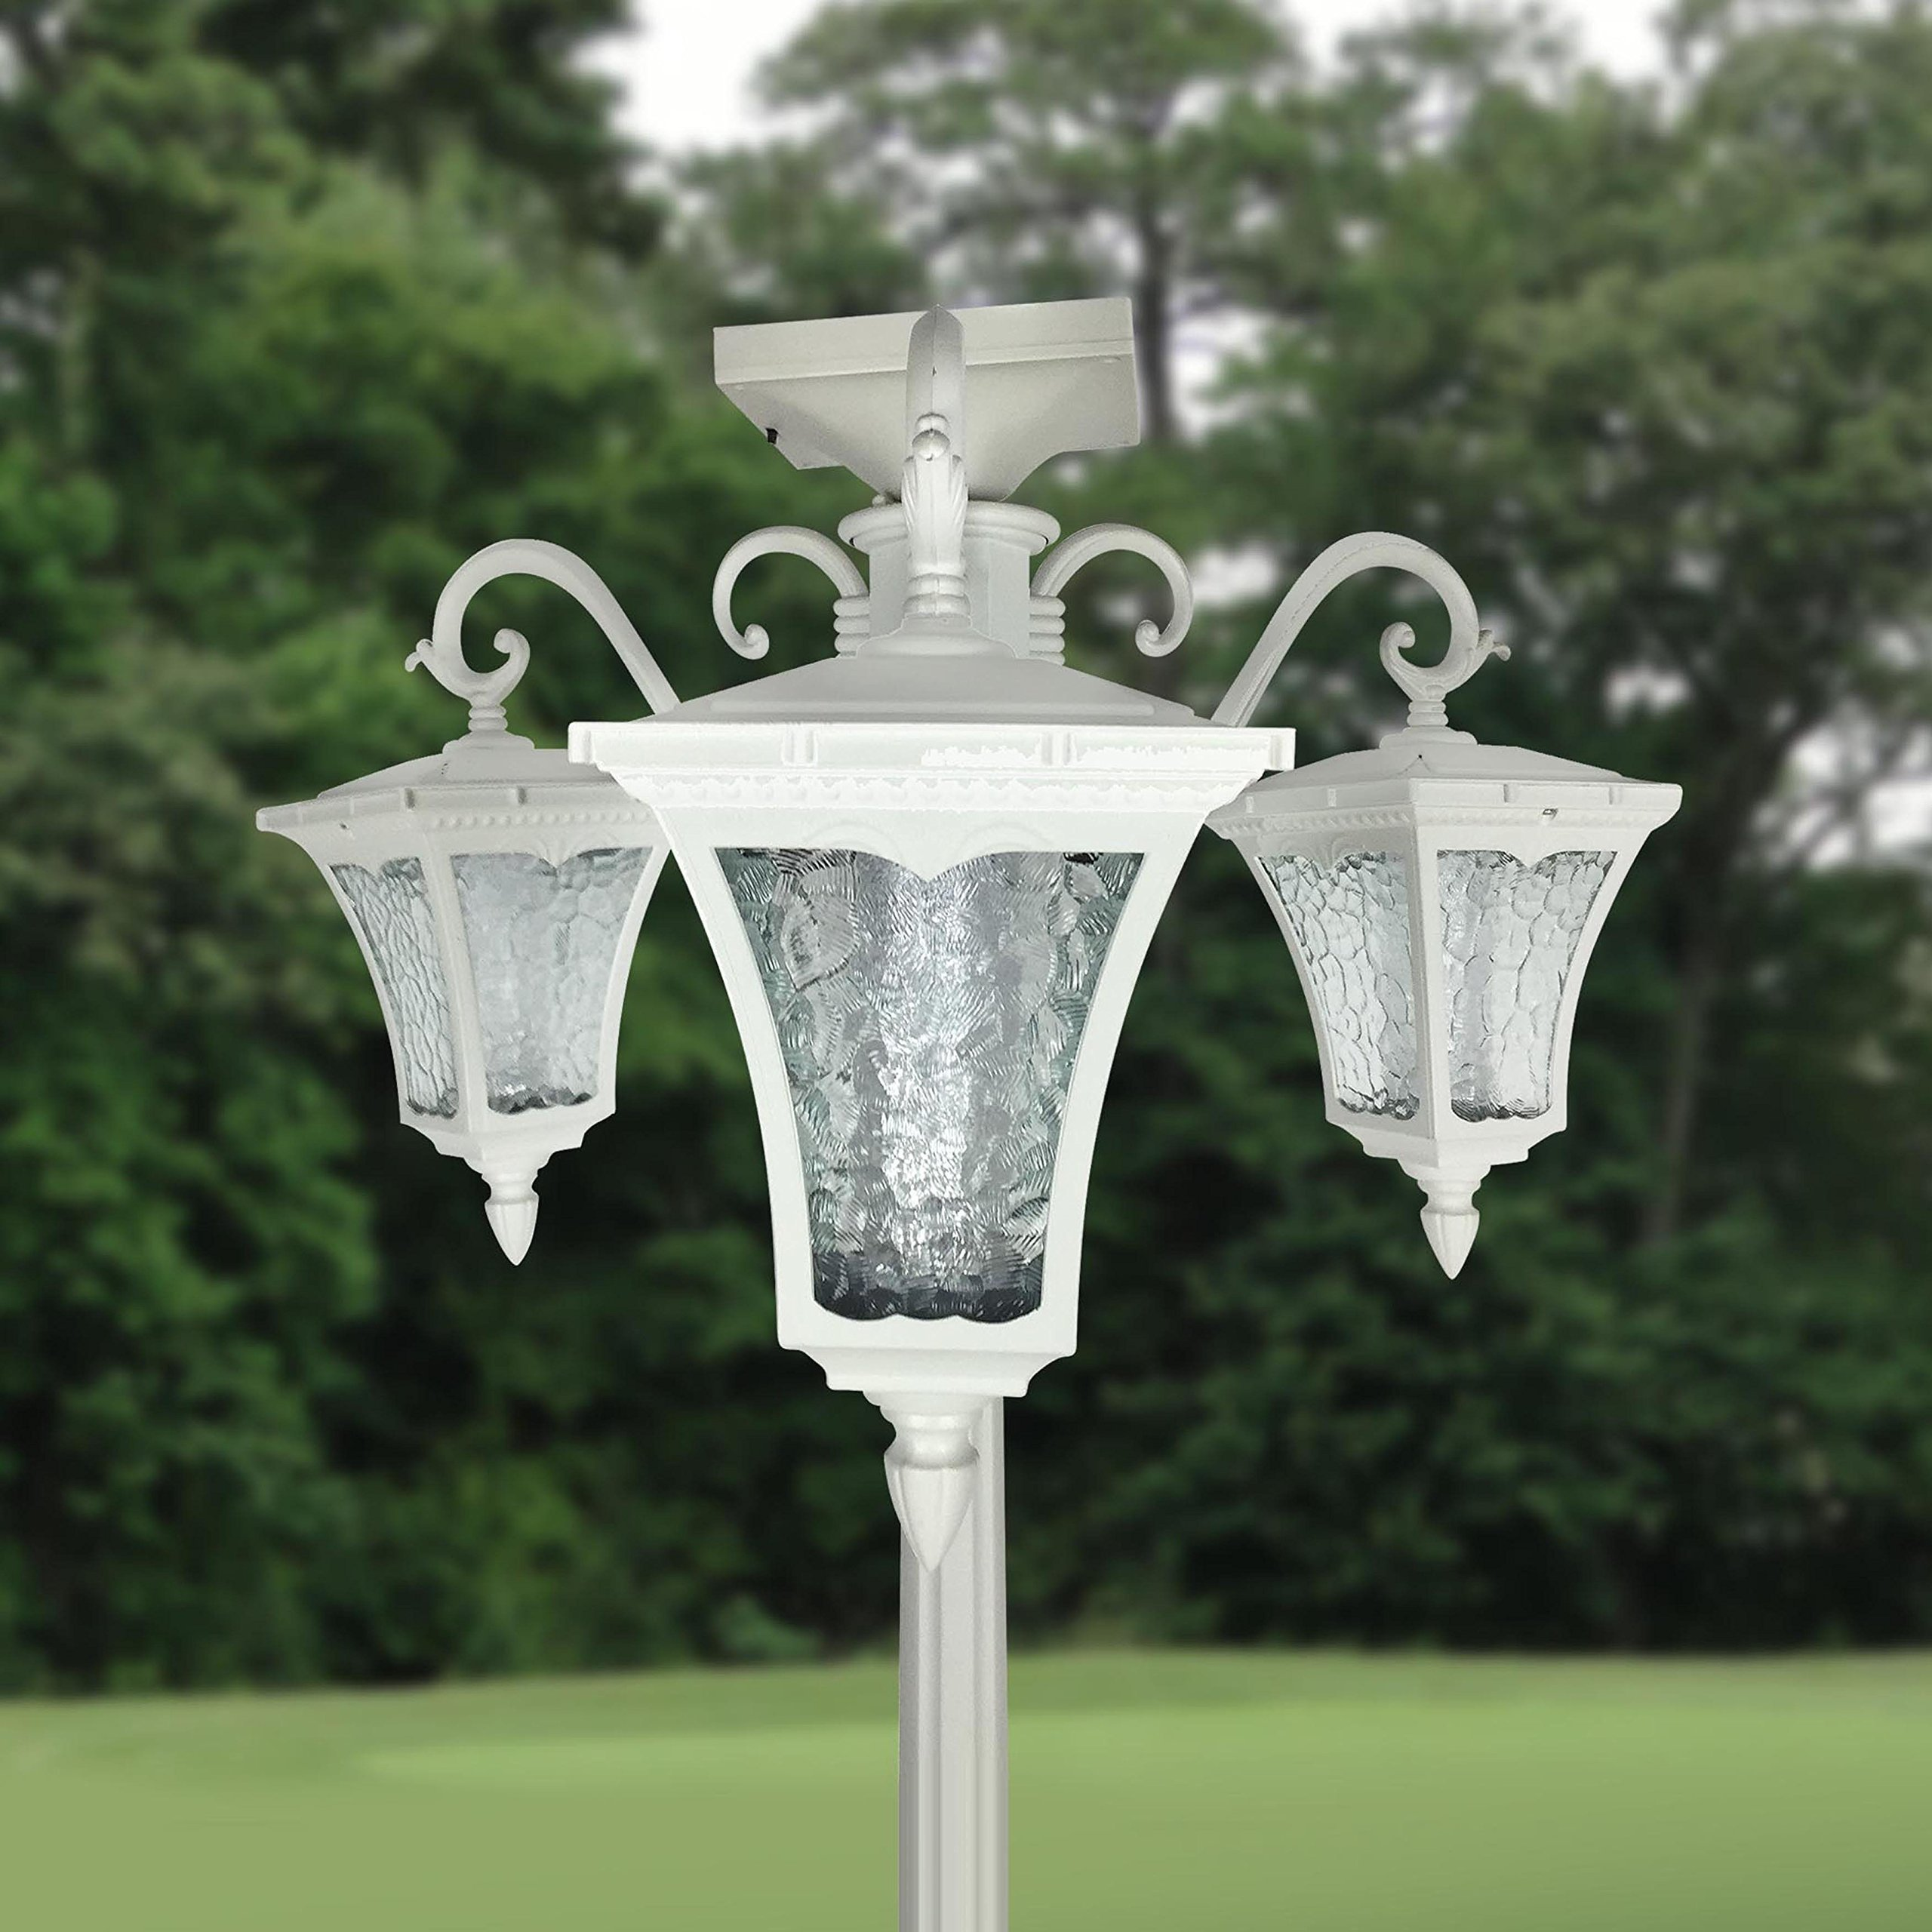 Outdoor Lighting, Outdoor Solar Lights, Outdoor Post Lighting, Solar Lamp Post, 80-inch High Three Head Solar Lamp Post and Planter